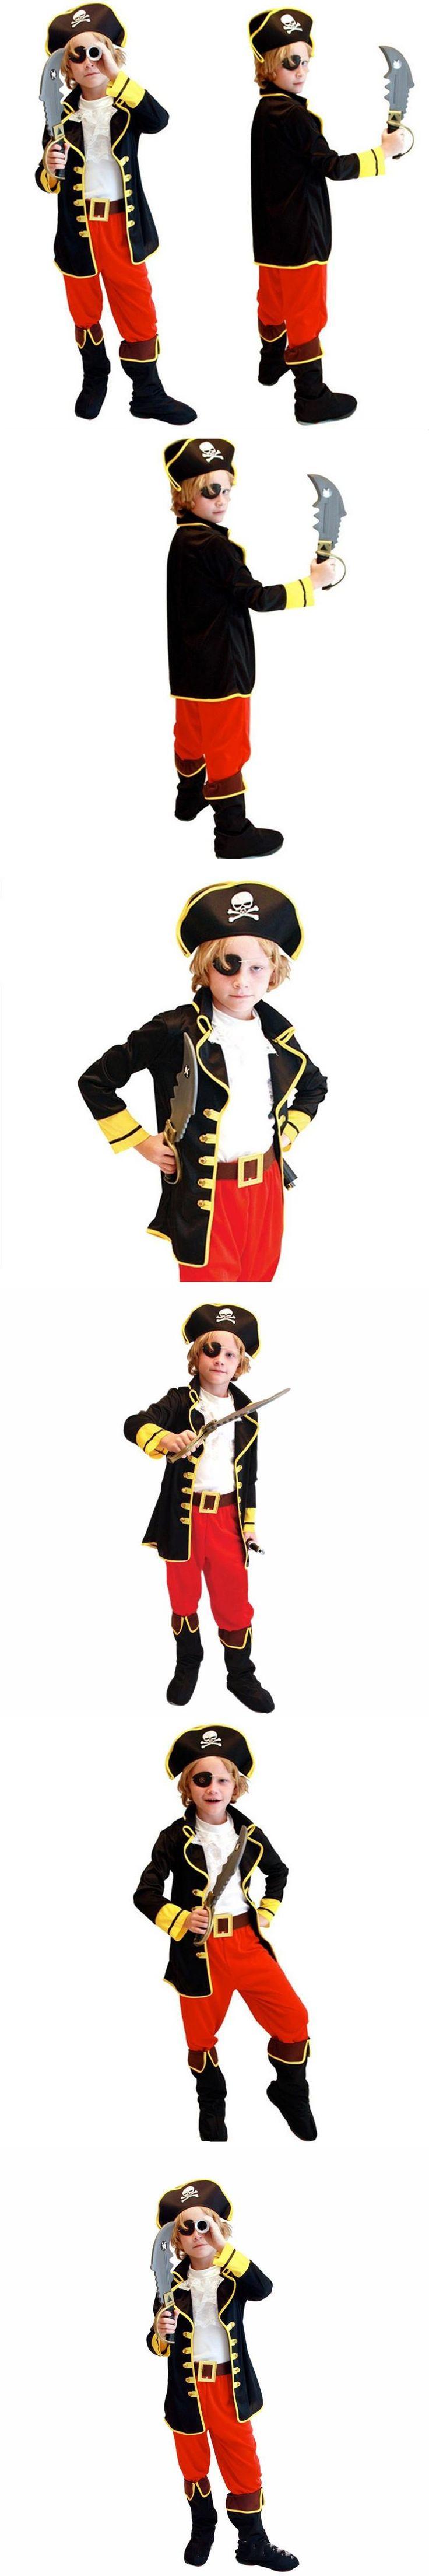 Kids Boys Pirate Costume Cosplay Costumes set for Boys Children Christmas New Year Purim Halloween Costumes For Kids Children